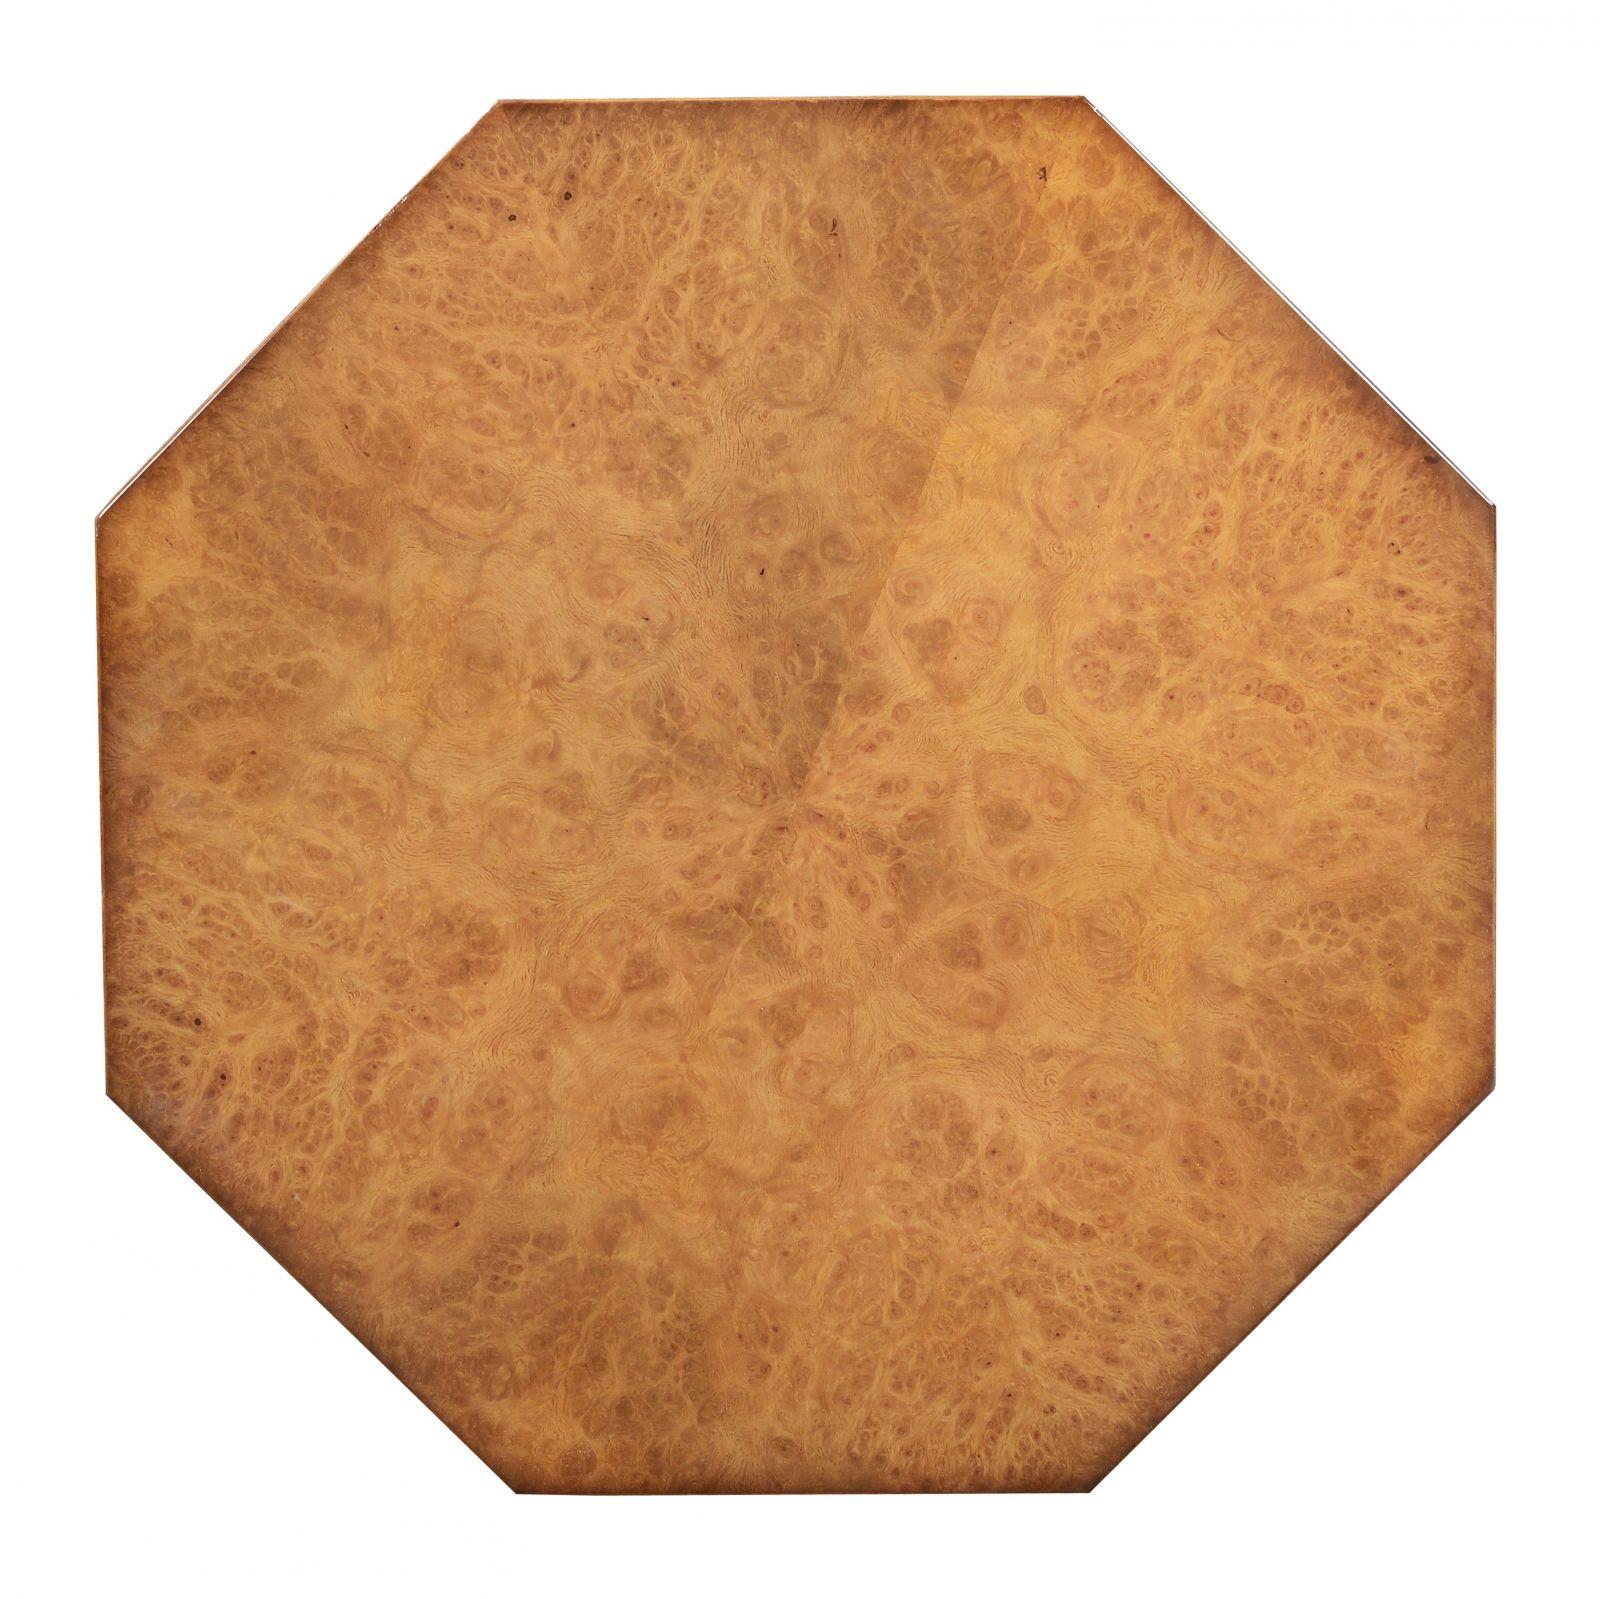 Octagonal wine table - Honey burr oak